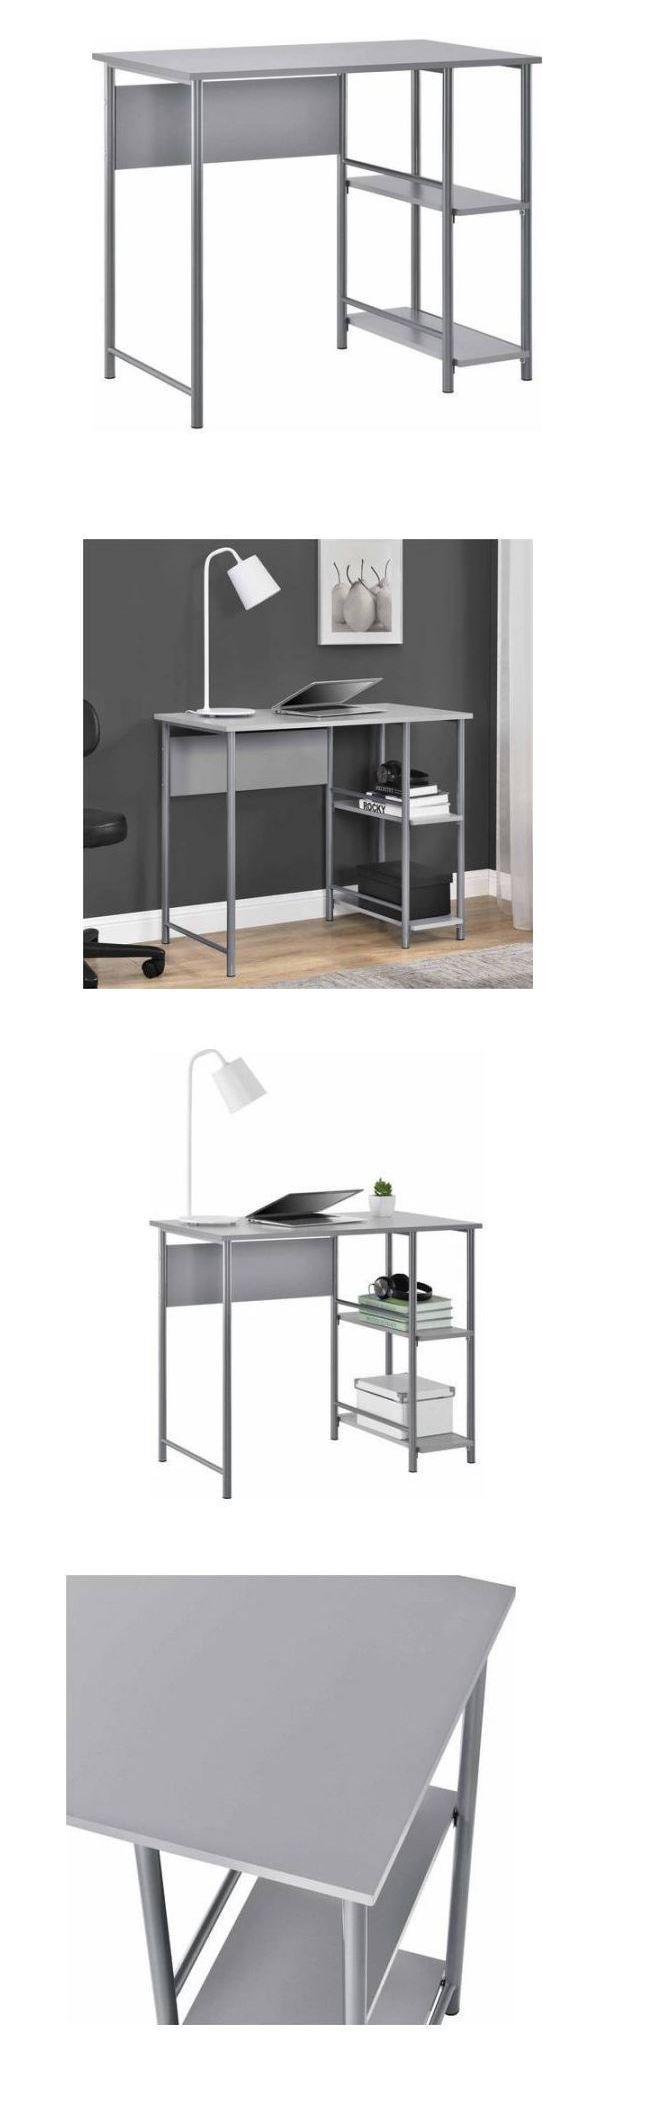 Desks 115750  Computer Desk For Small Spaces Student Home Office Storage  Furniture Laptop Art. Best 25  Small computer desks ideas on Pinterest   Small desk